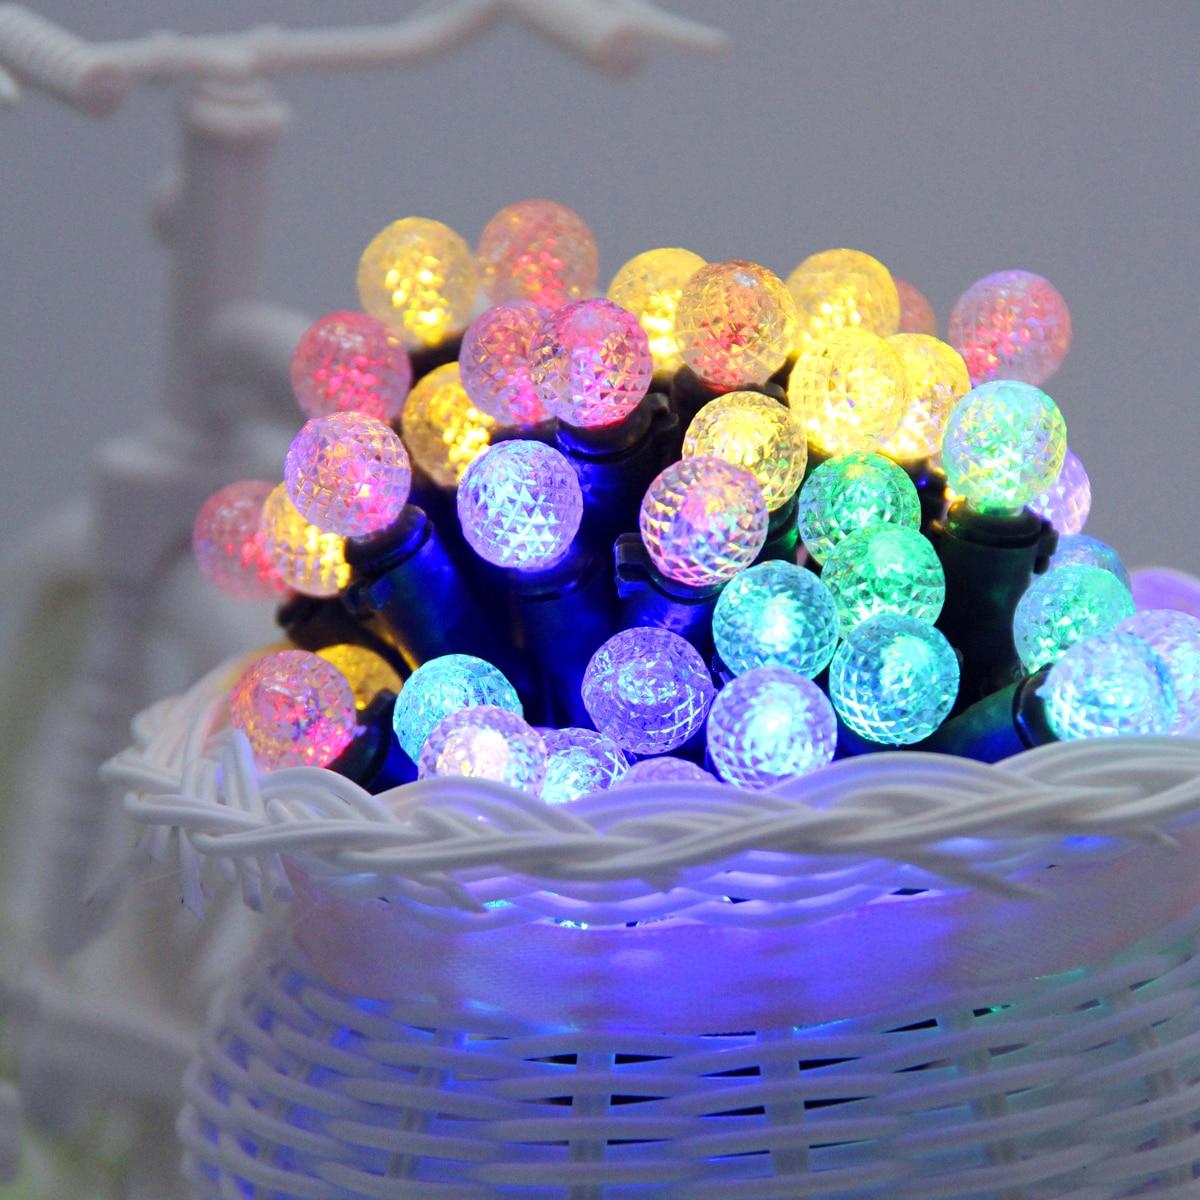 Binval Solar LED Lights 50 LEDs Holiday Lighting Garden Decor Solar Powered Garden Fairy Lights Led Decoration Lights Colorful